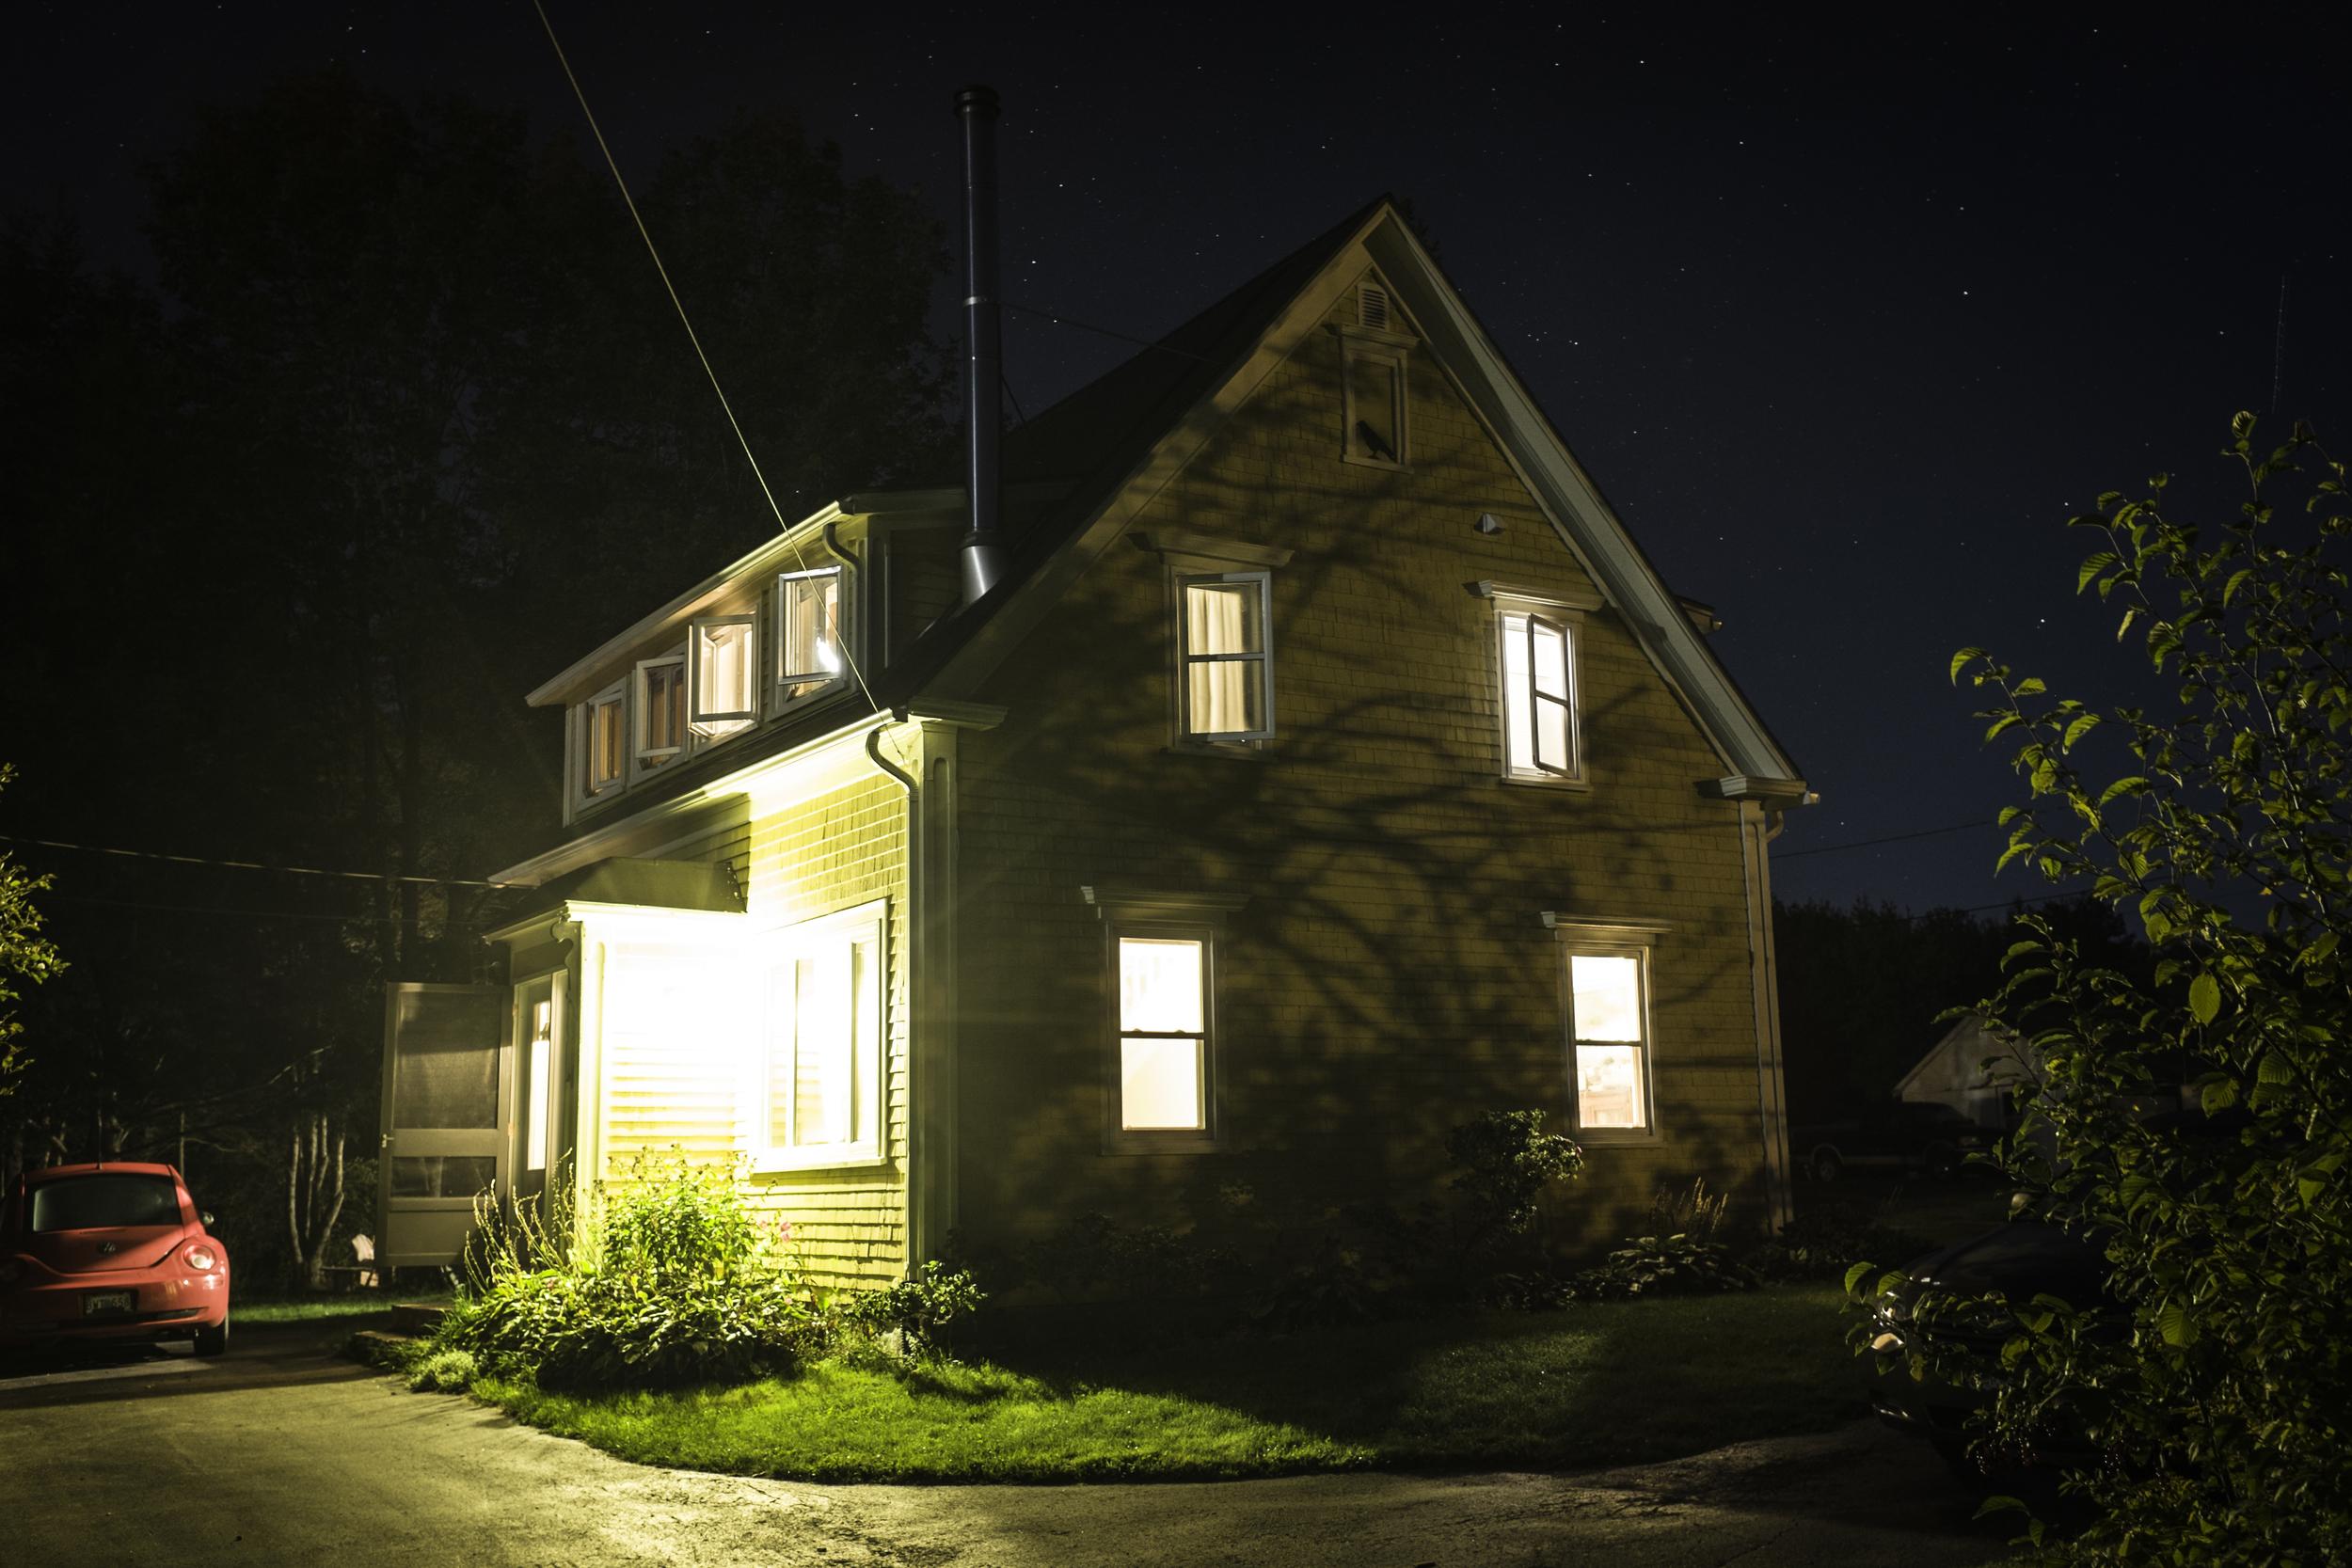 house by night.jpg